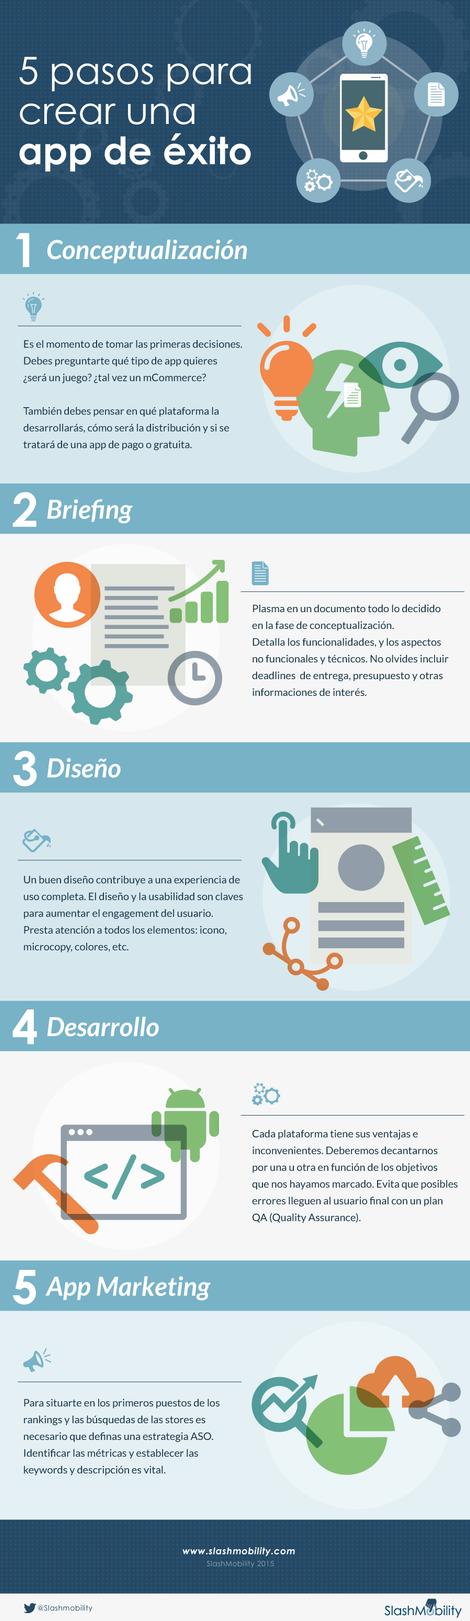 imp_infografia_creacion-de-una-app_v2-1.